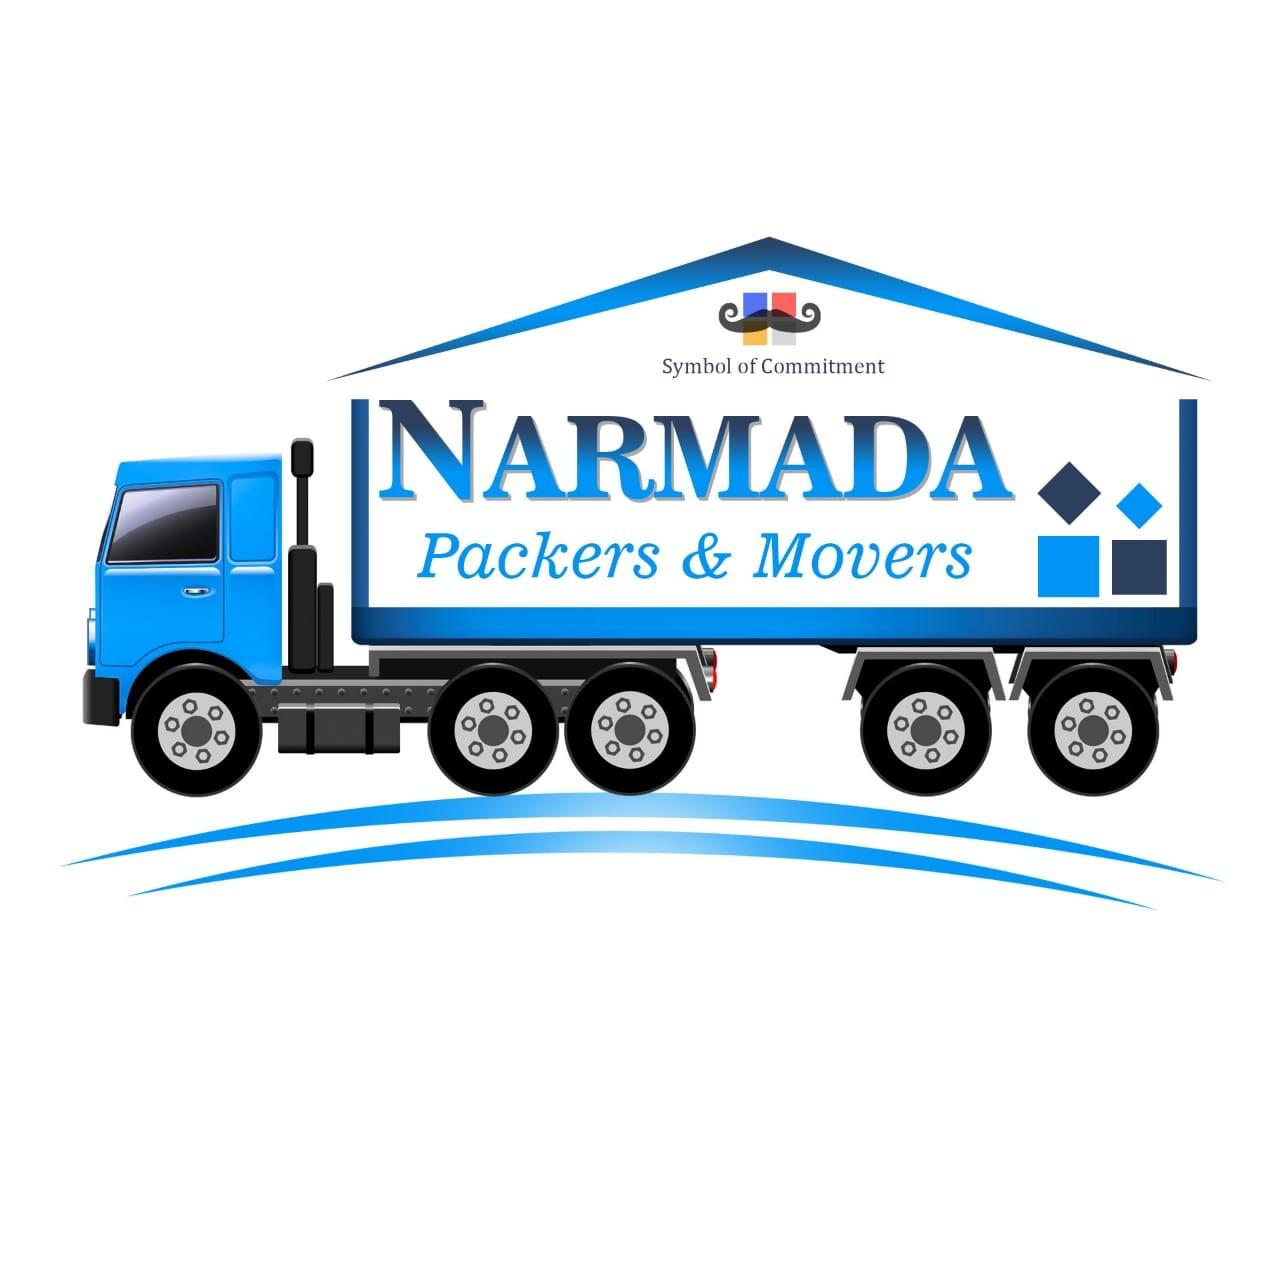 Narmada Packers & movers